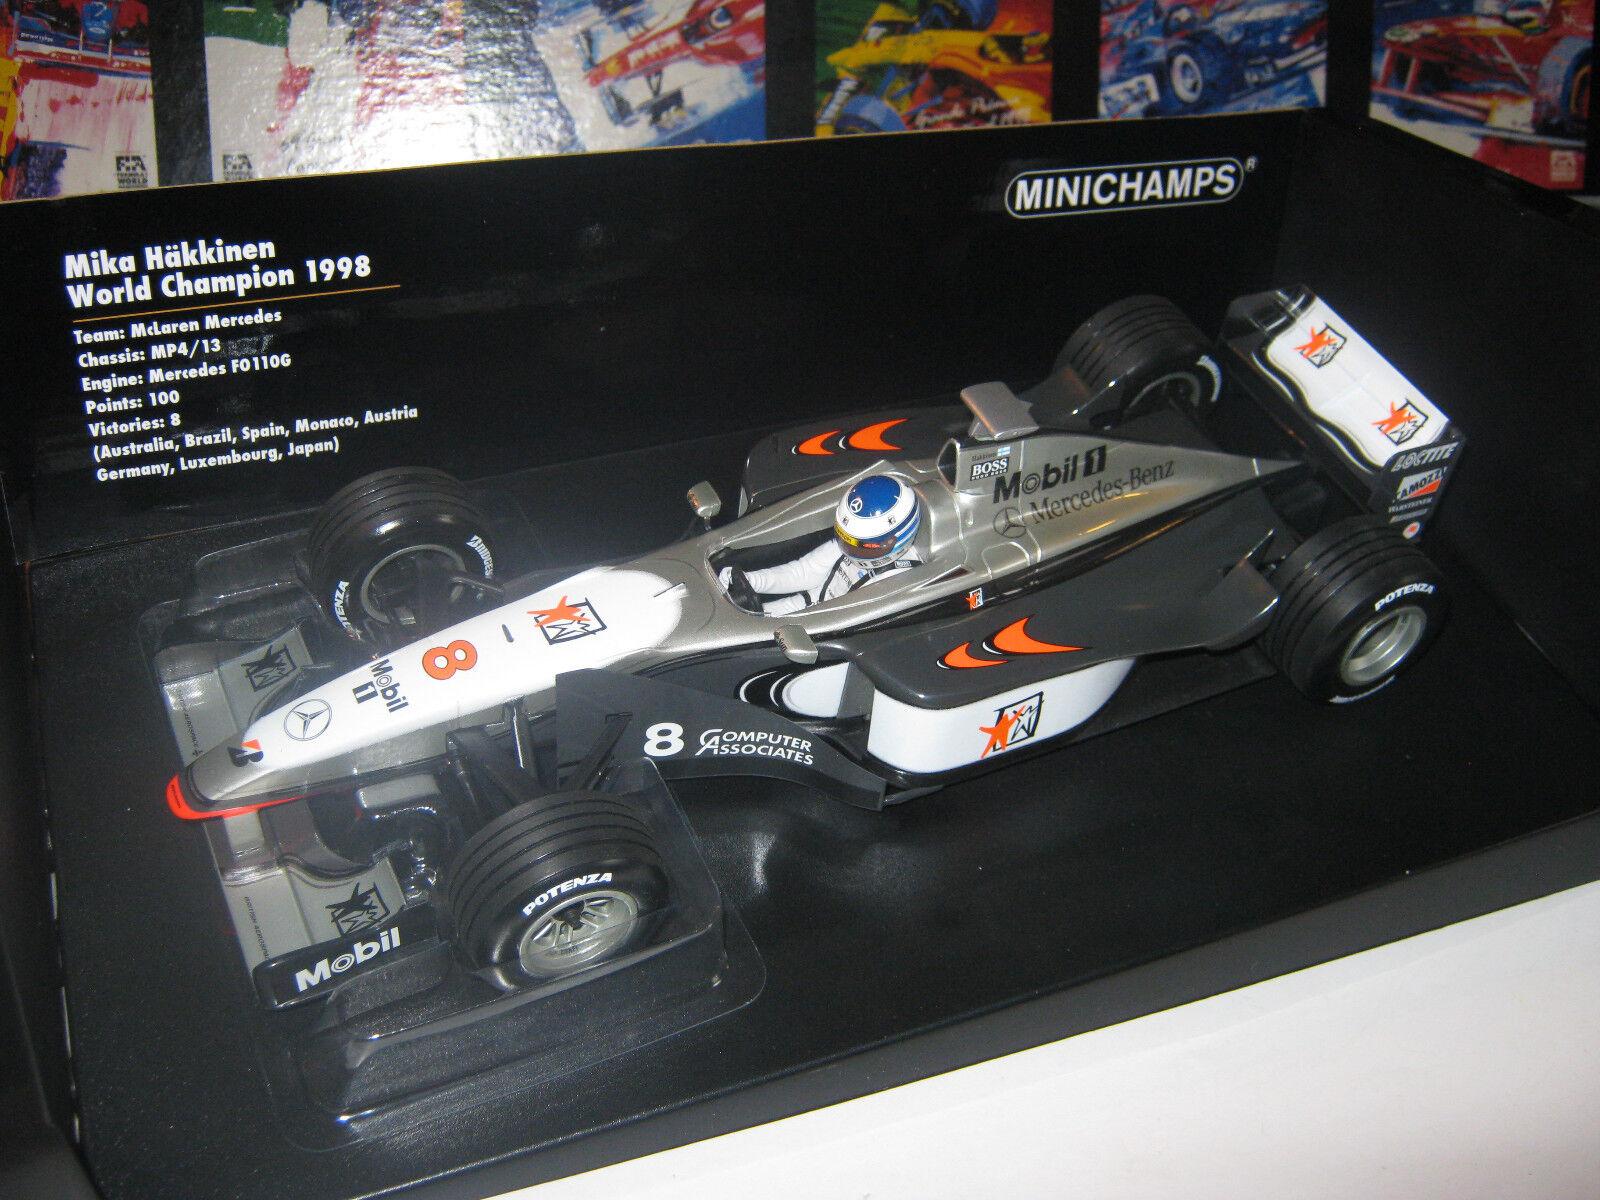 1 18 McLaren Mercedes mp4 13 WC M. Hakkinen 1998 Minichamps 186980008 neuf dans sa boîte New